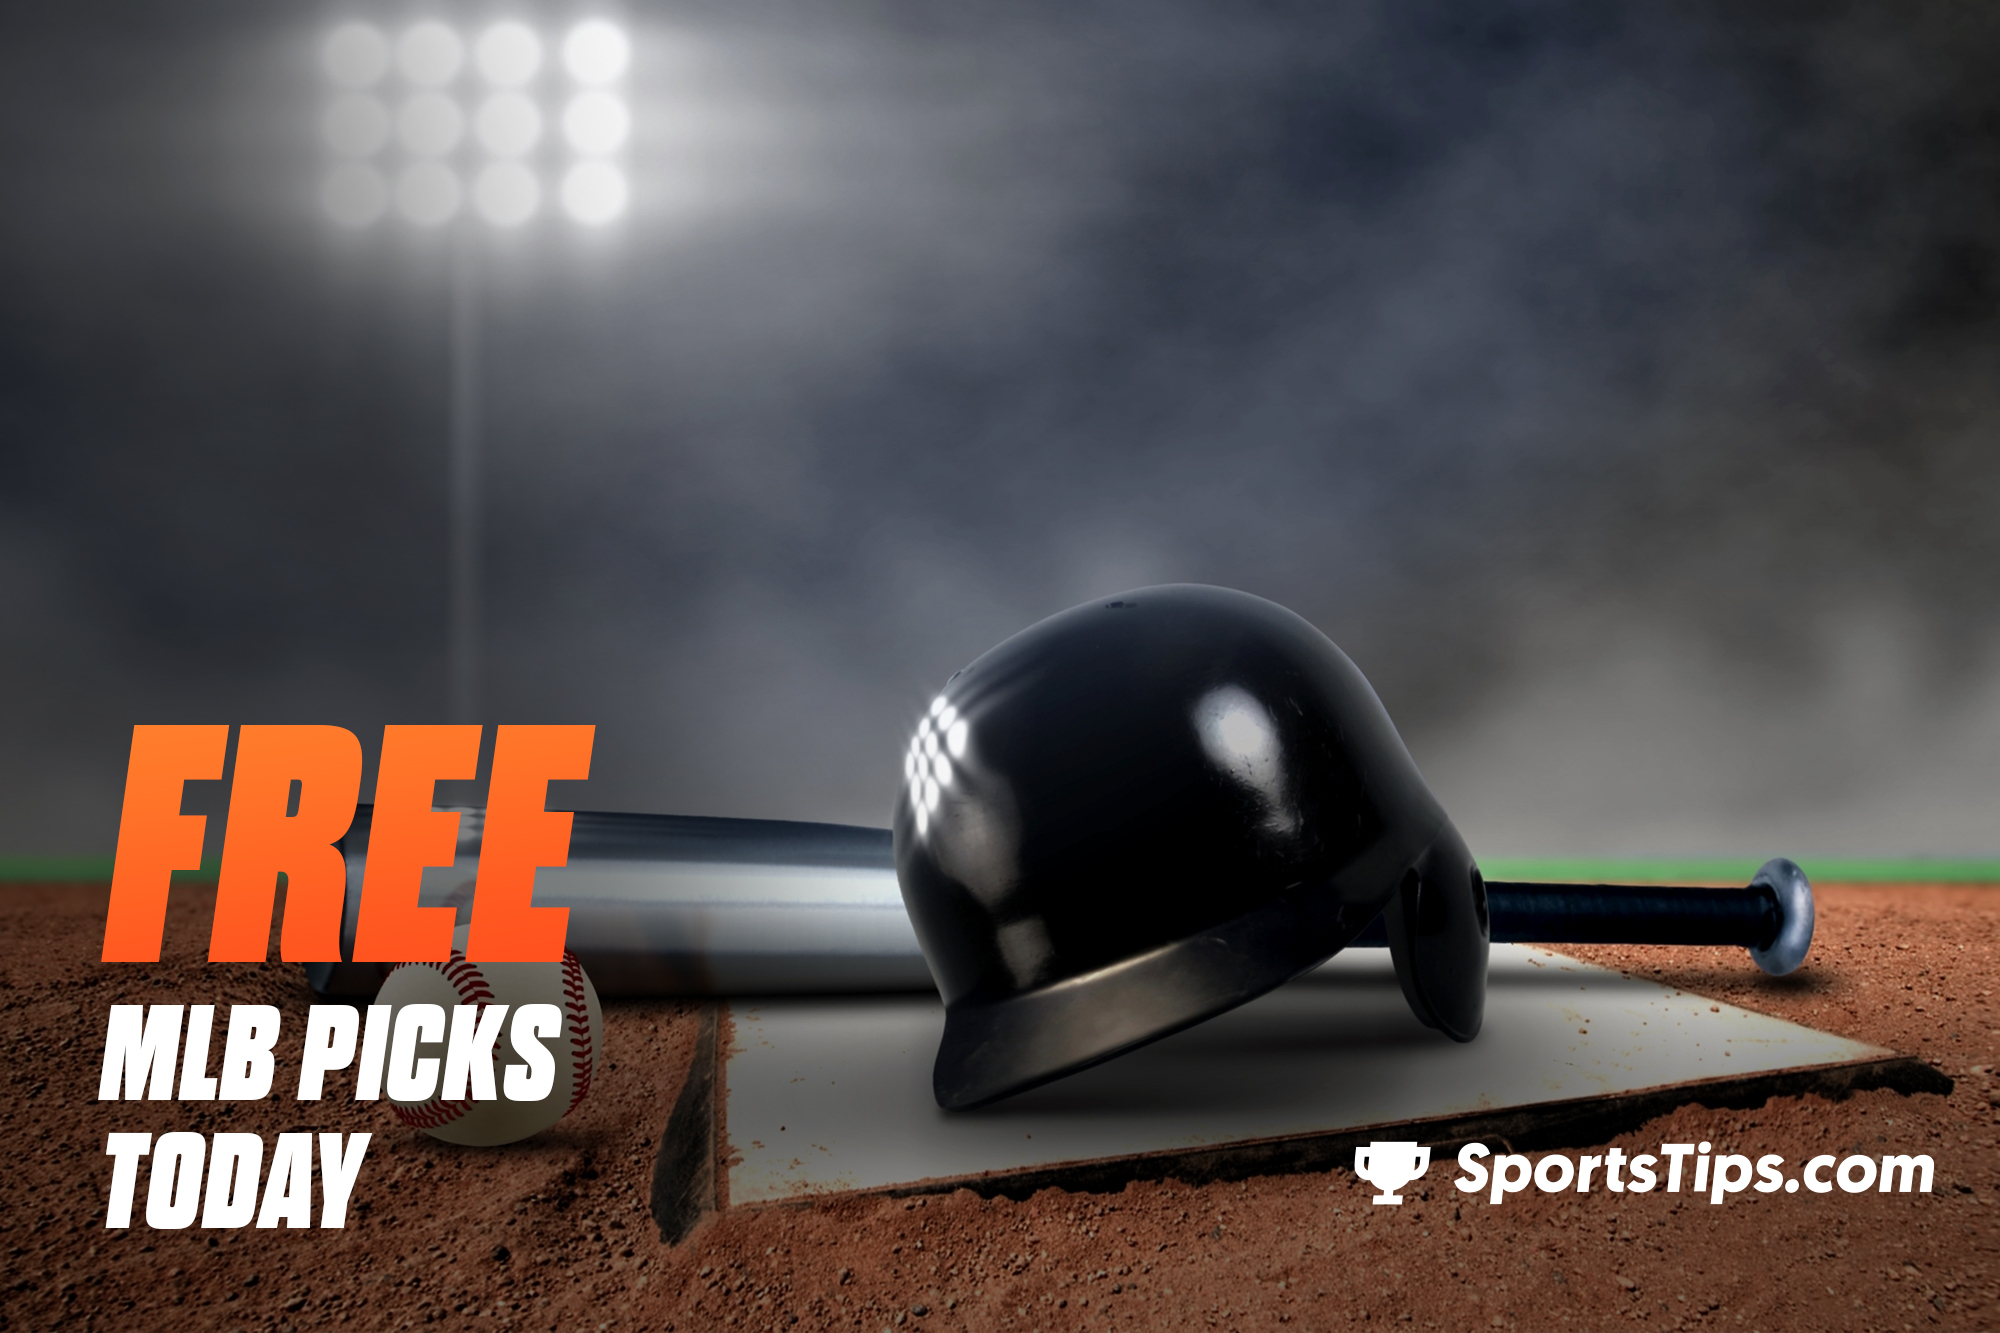 Free MLB Picks Today for Saturday, April 3rd, 2021